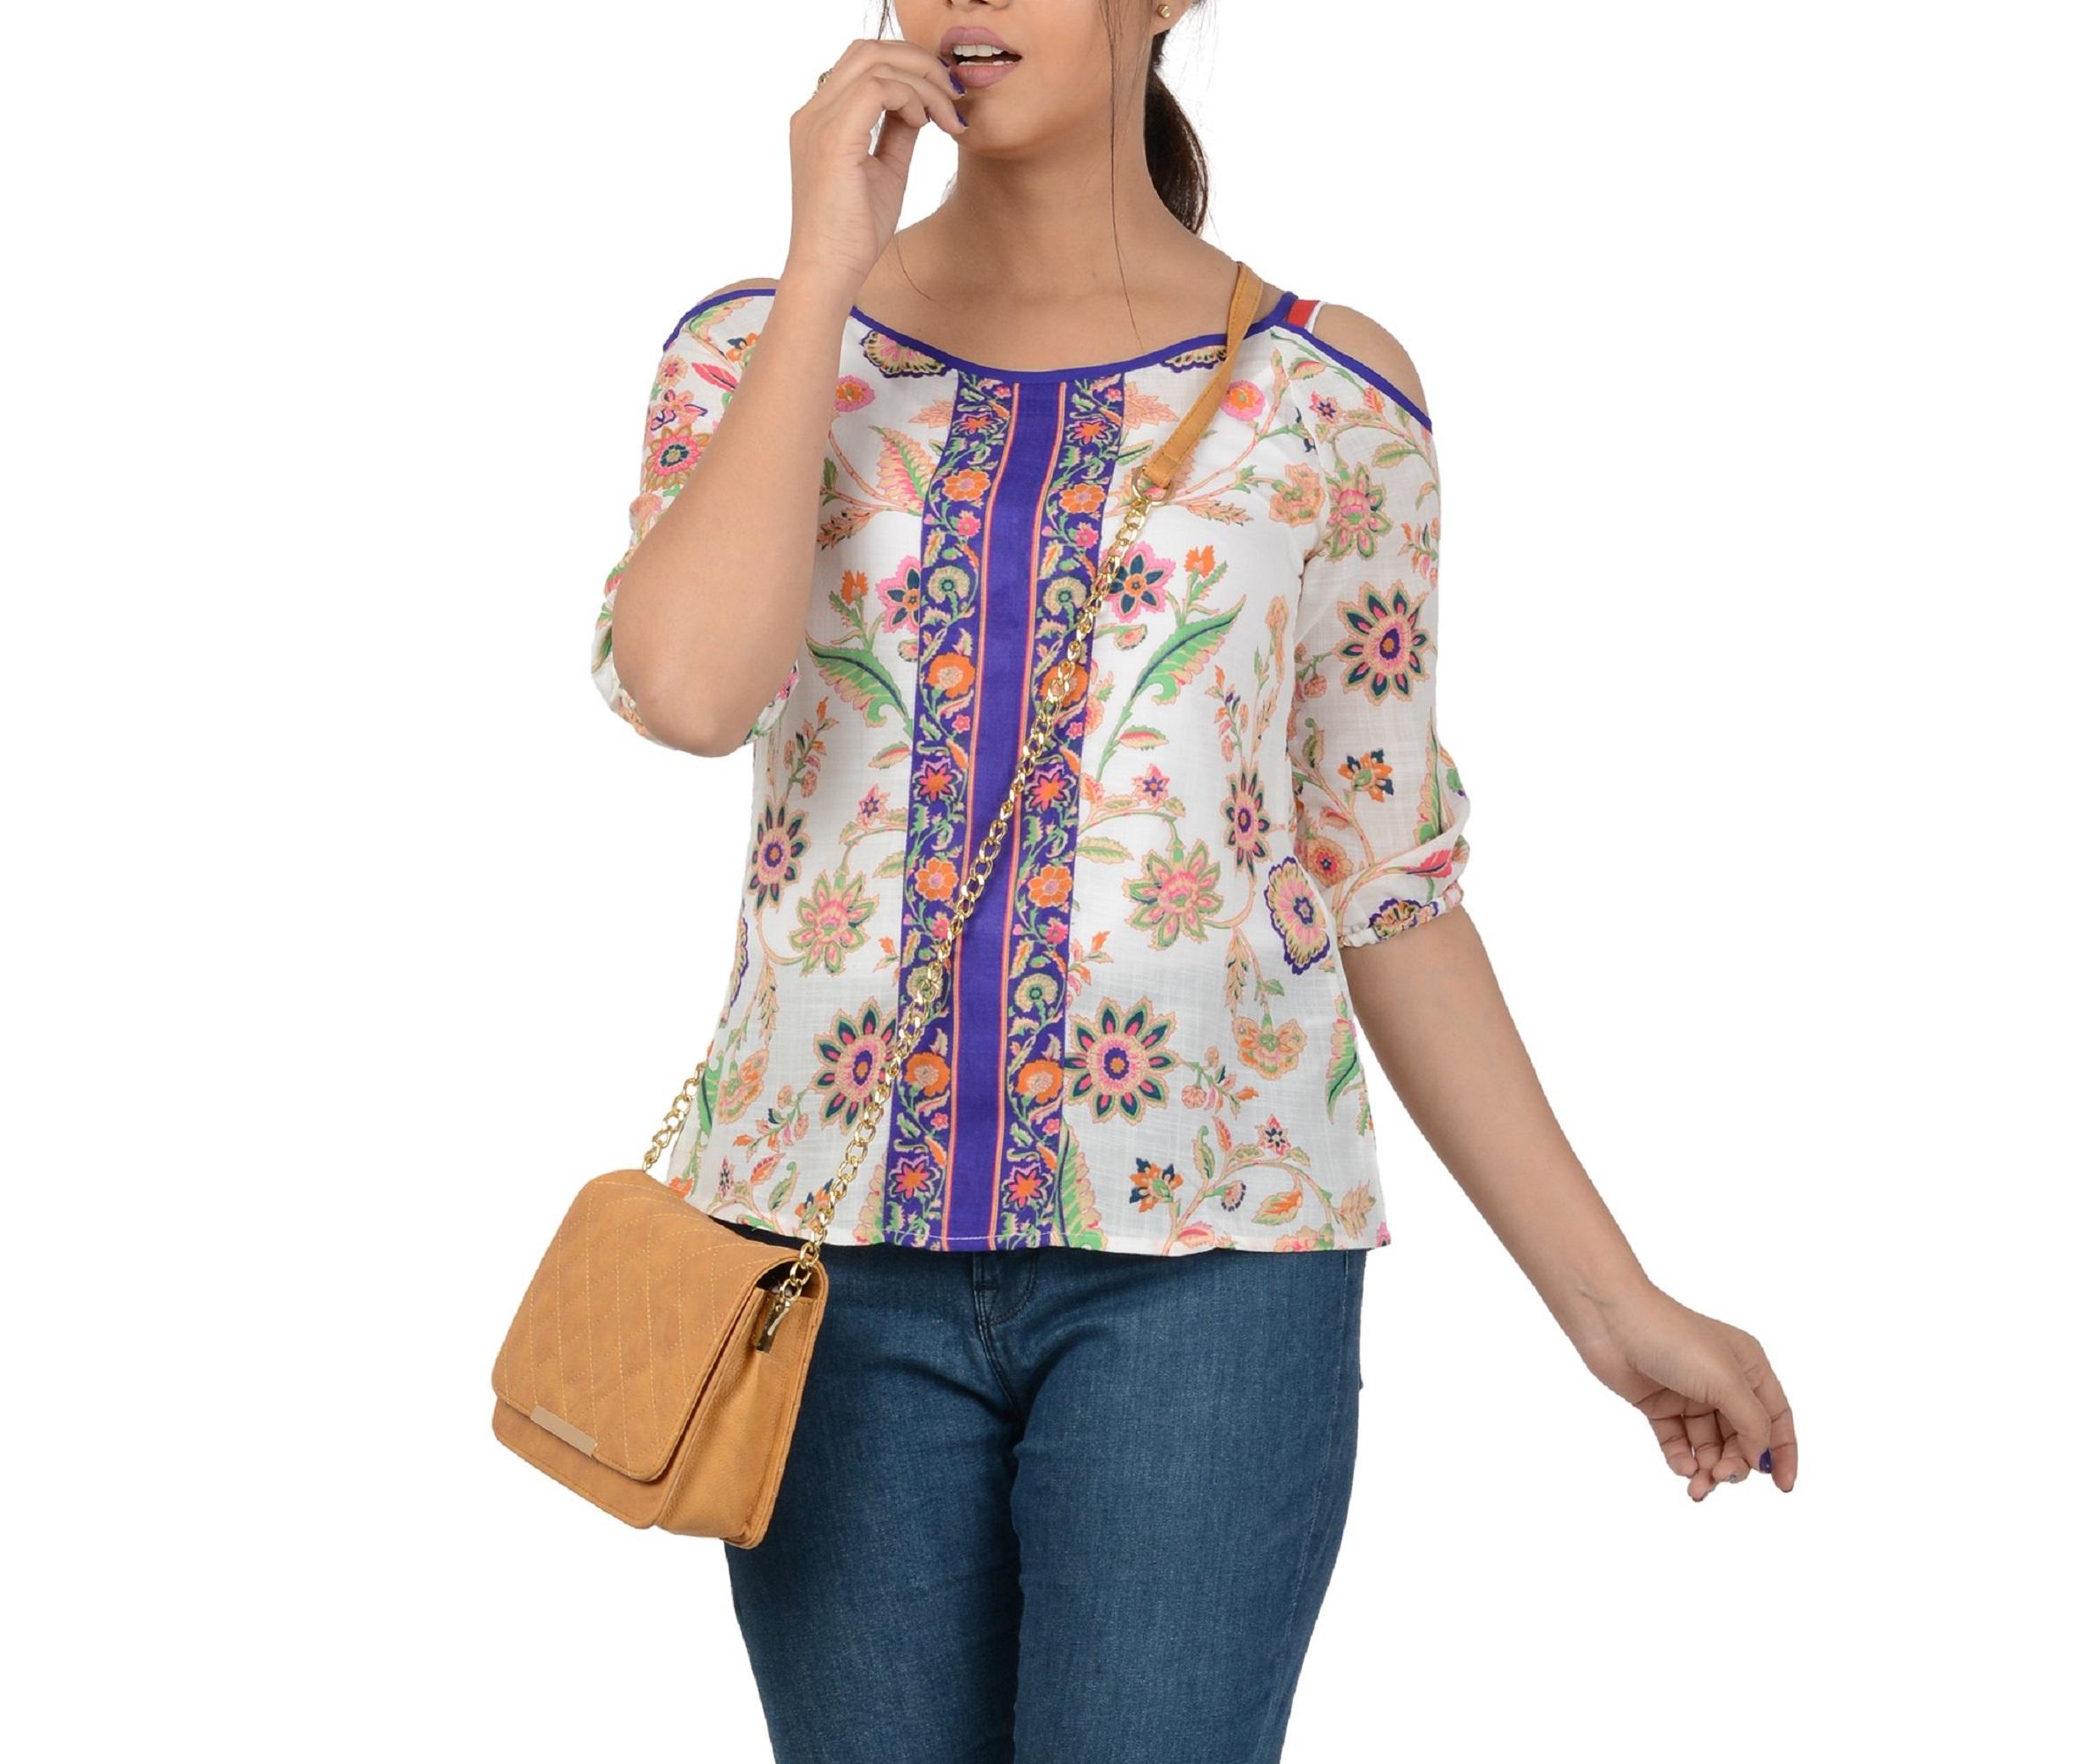 Vivinkaa | Vivinkaa leatherette maroon quilt embroidered camel sling